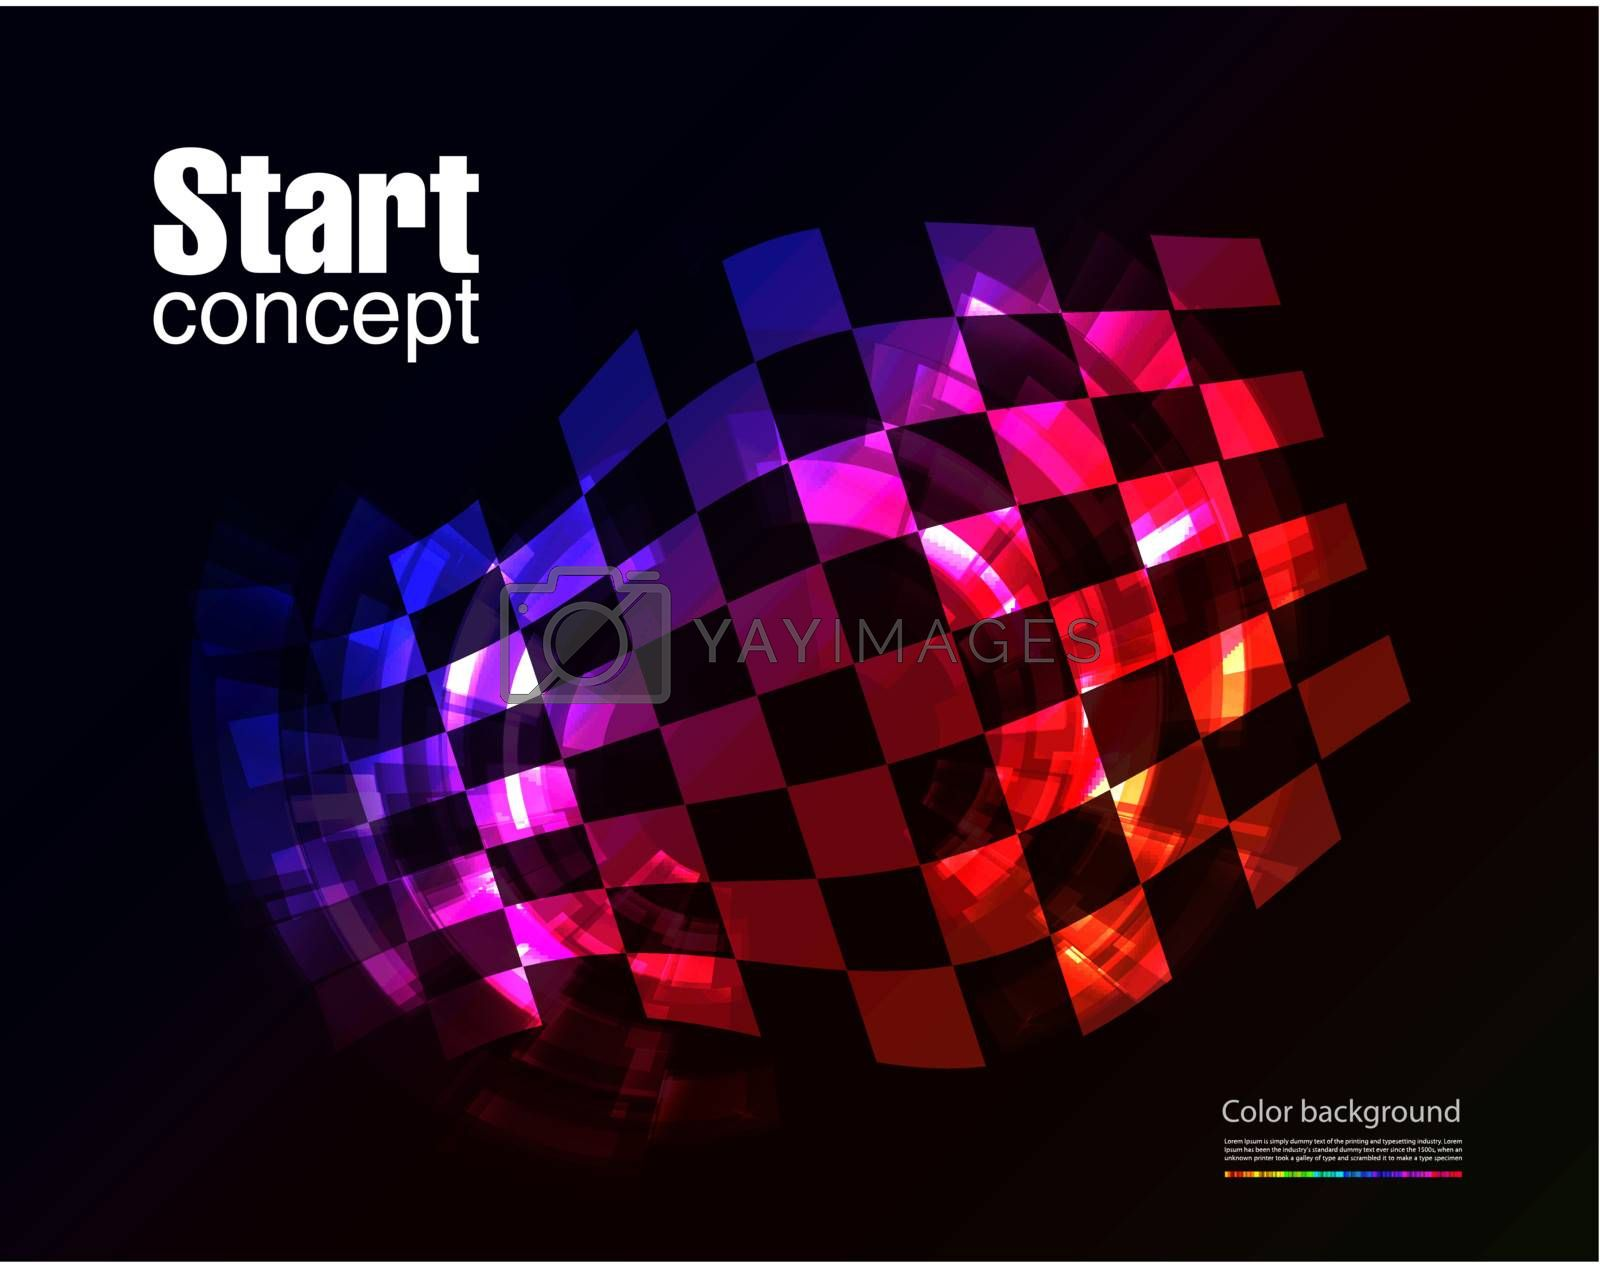 Checkered winding flag on black background. Concept illustration